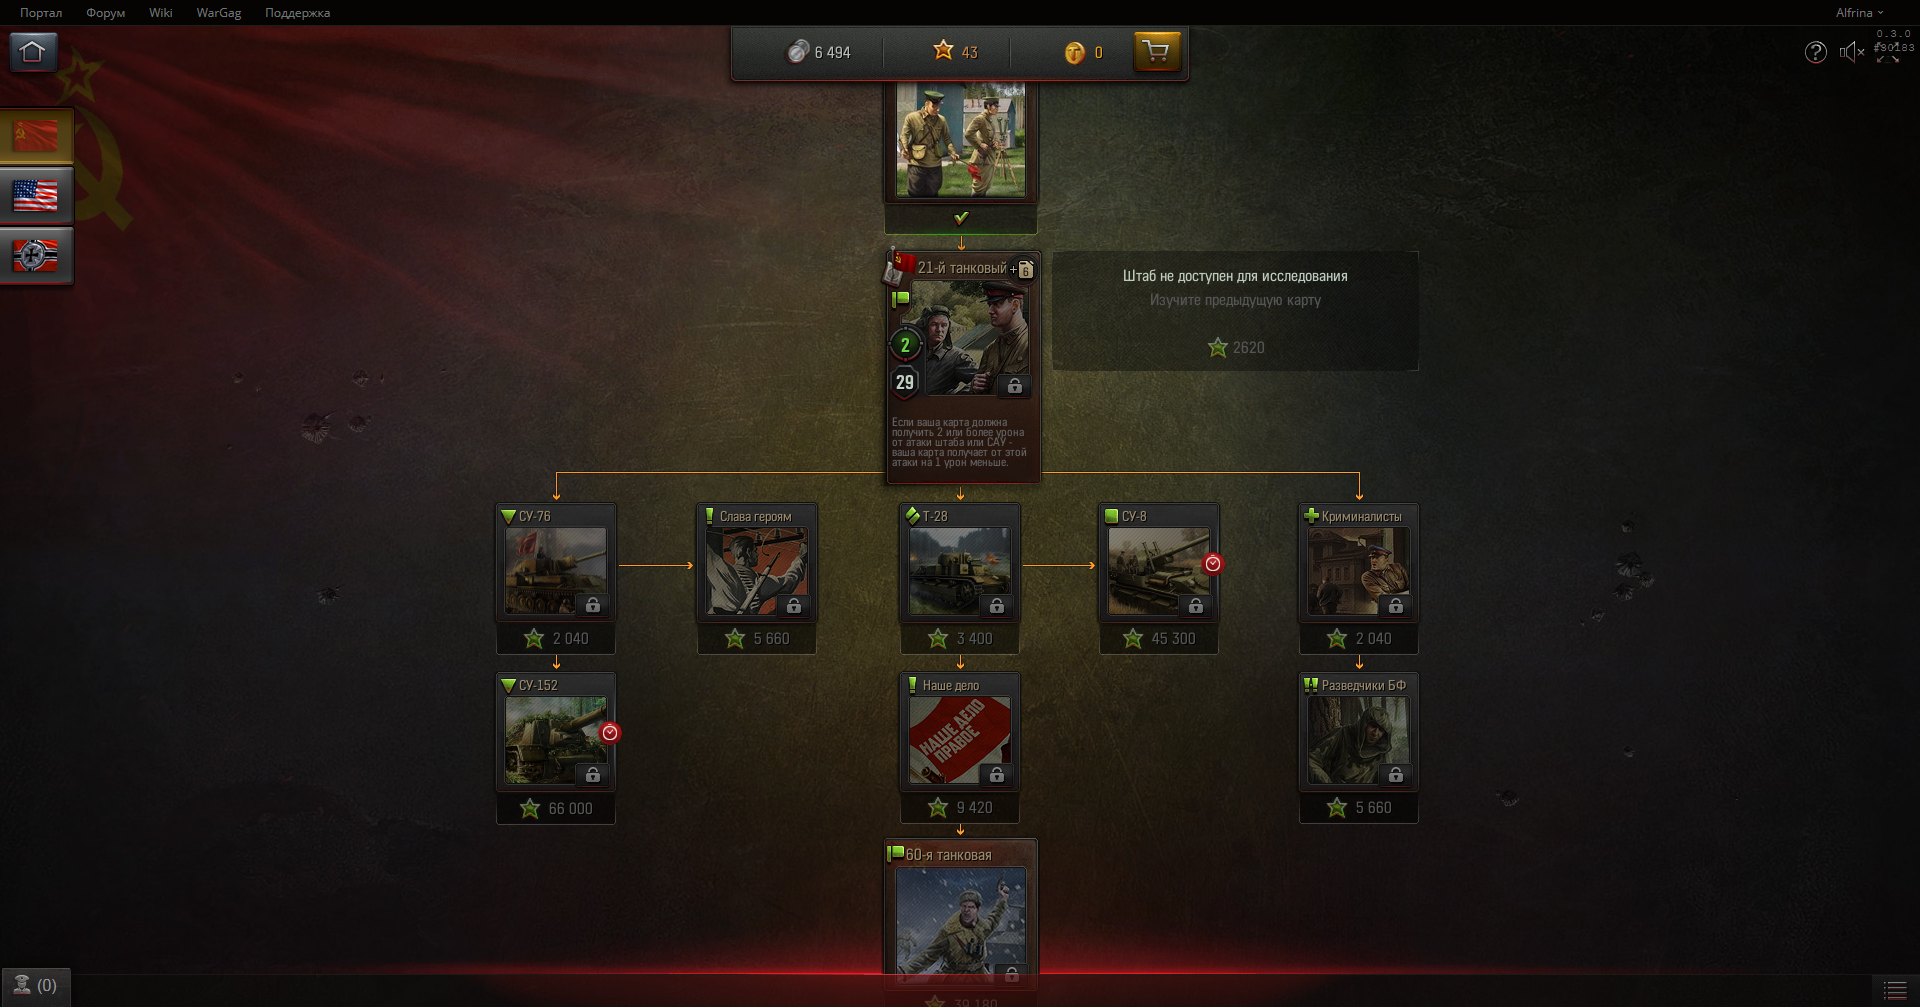 Раздача ключей в бета-версию World of Tanks Generals! - Изображение 4